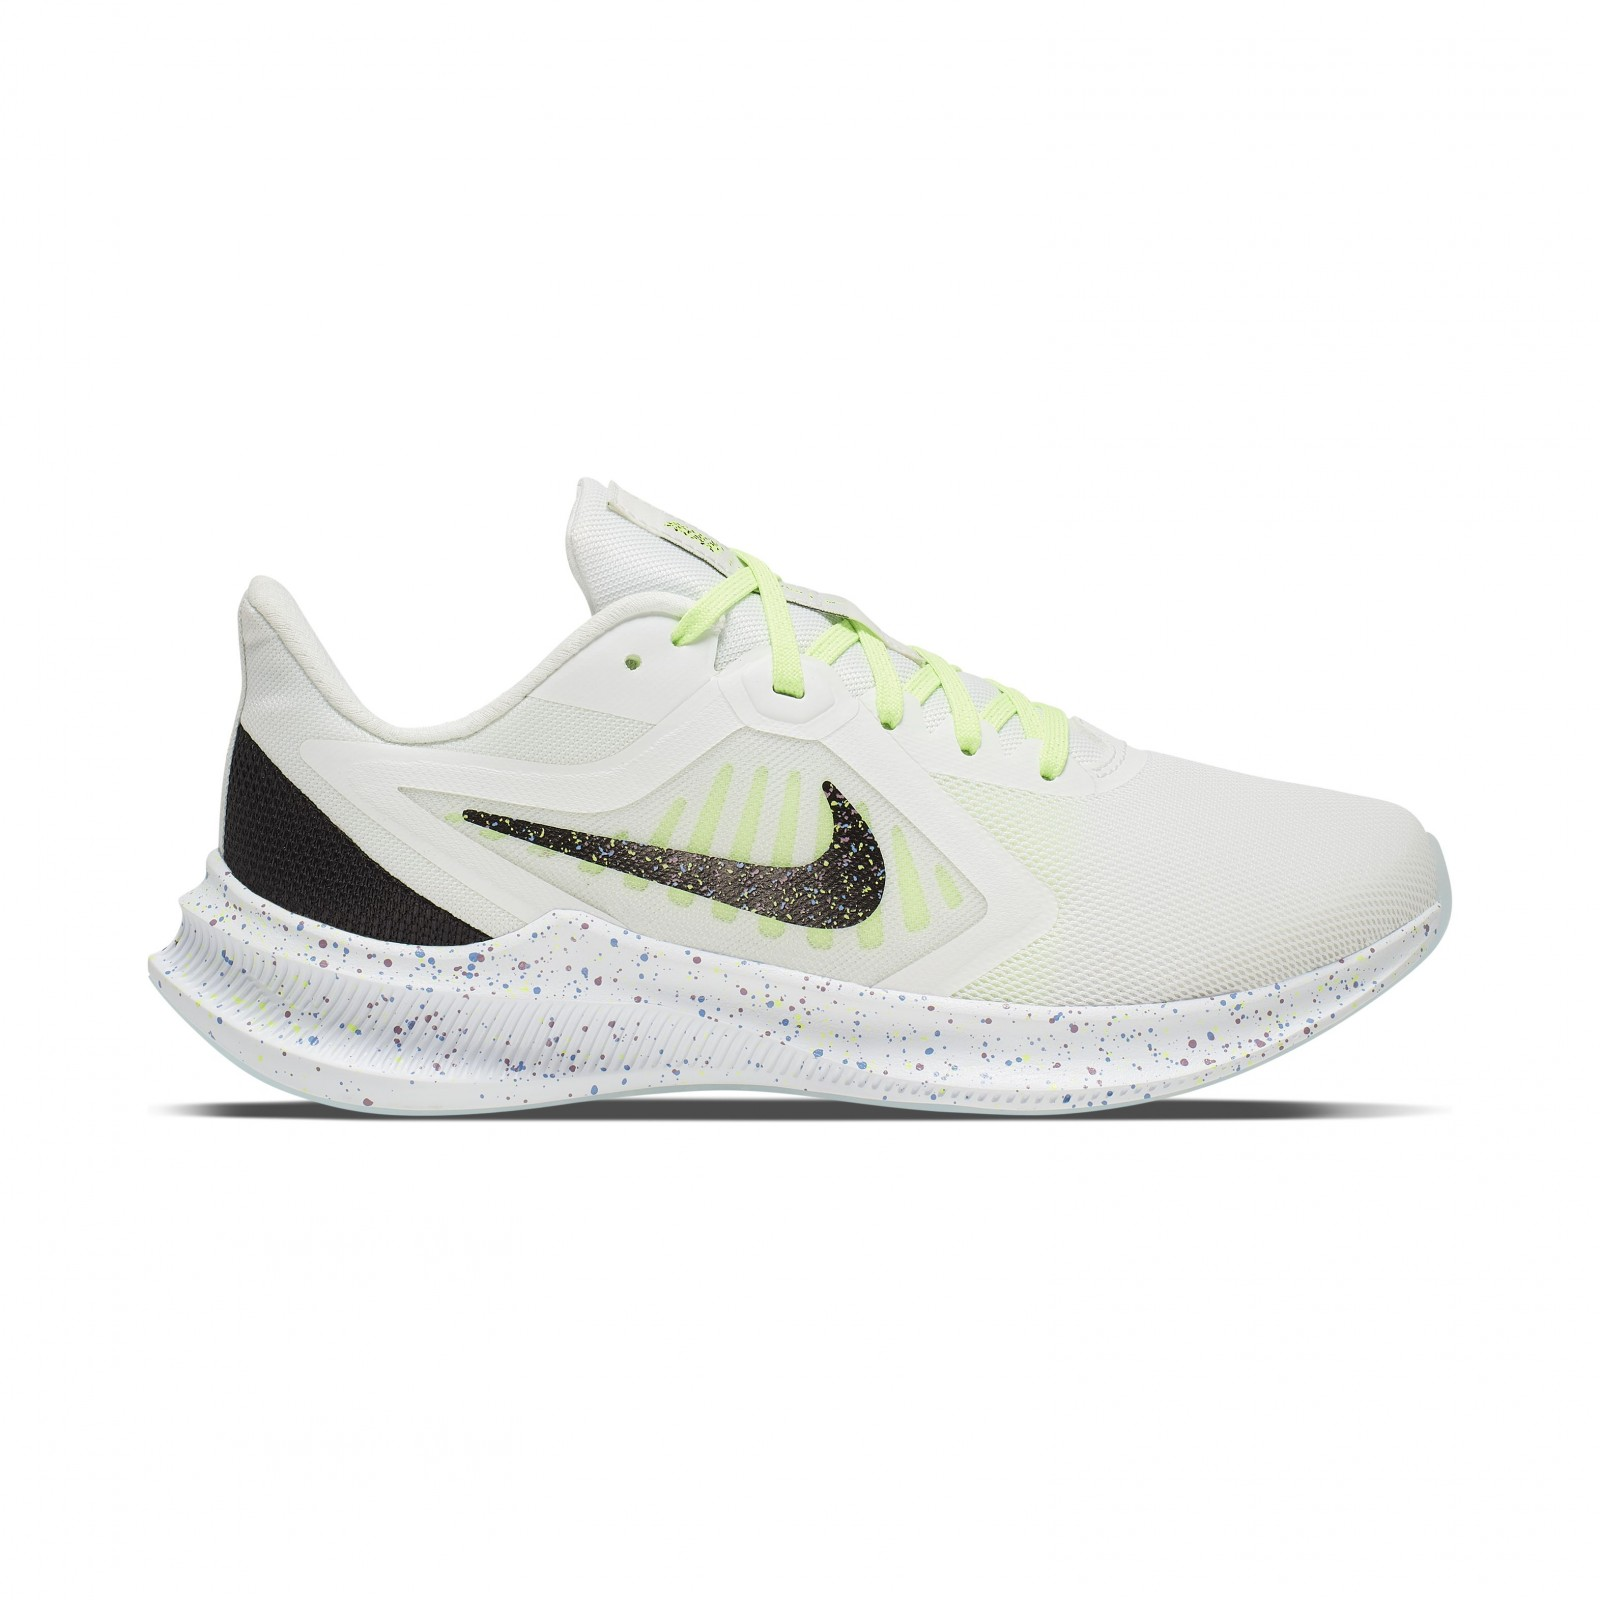 Nike Downshifter 10 SE SUMMIT WHITE/BLACK-GHOST GREEN